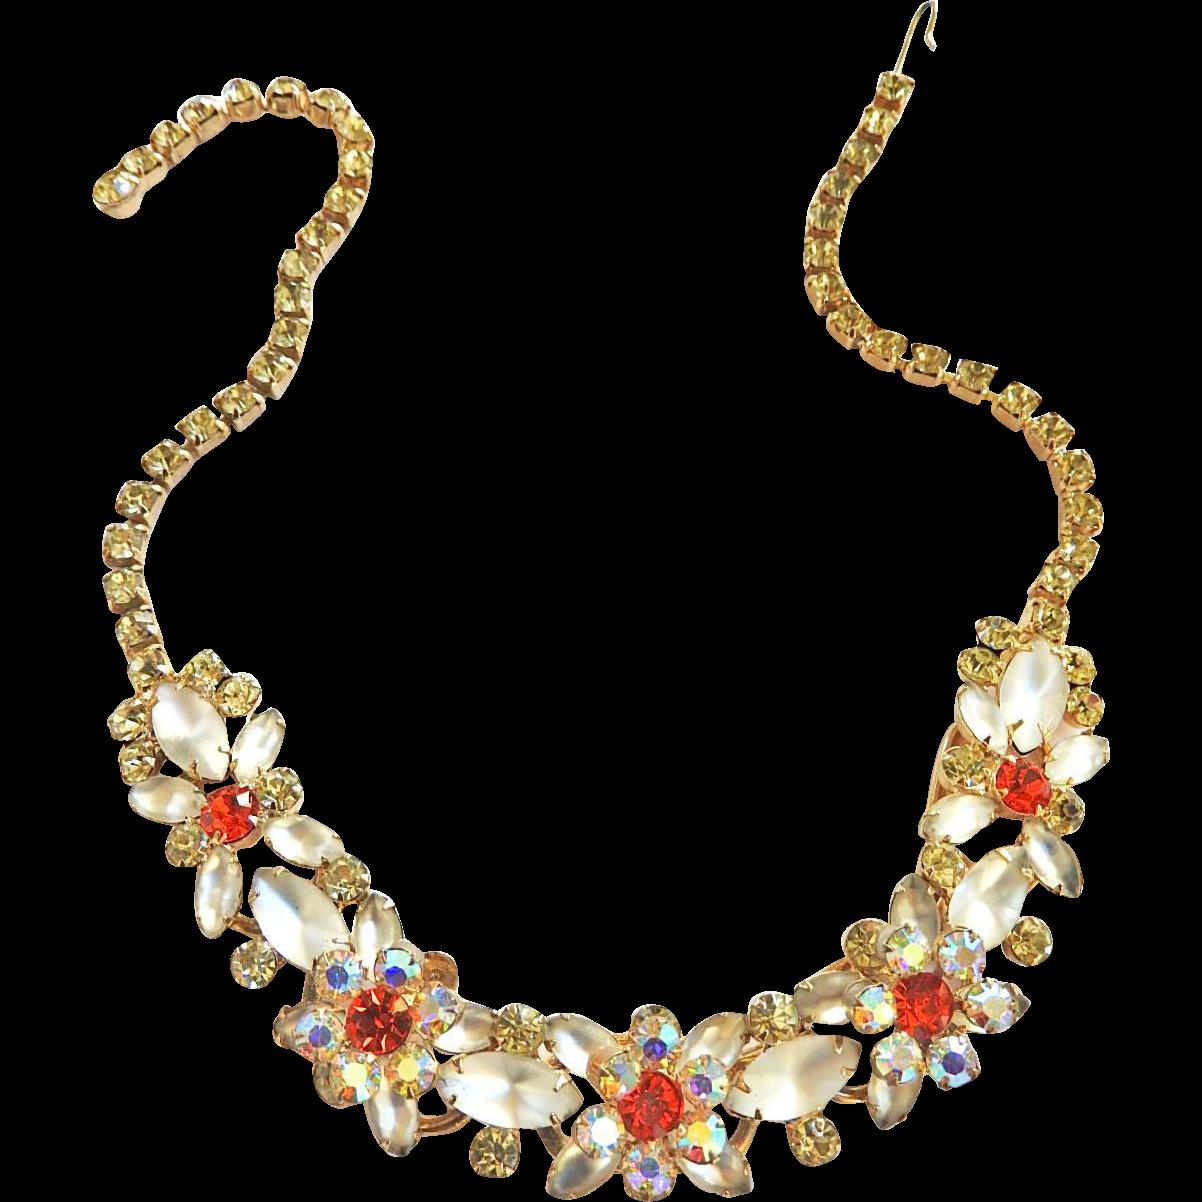 Vintage Juliana Hyacinth and Givre 5 Link Necklace Bracelet Earrings